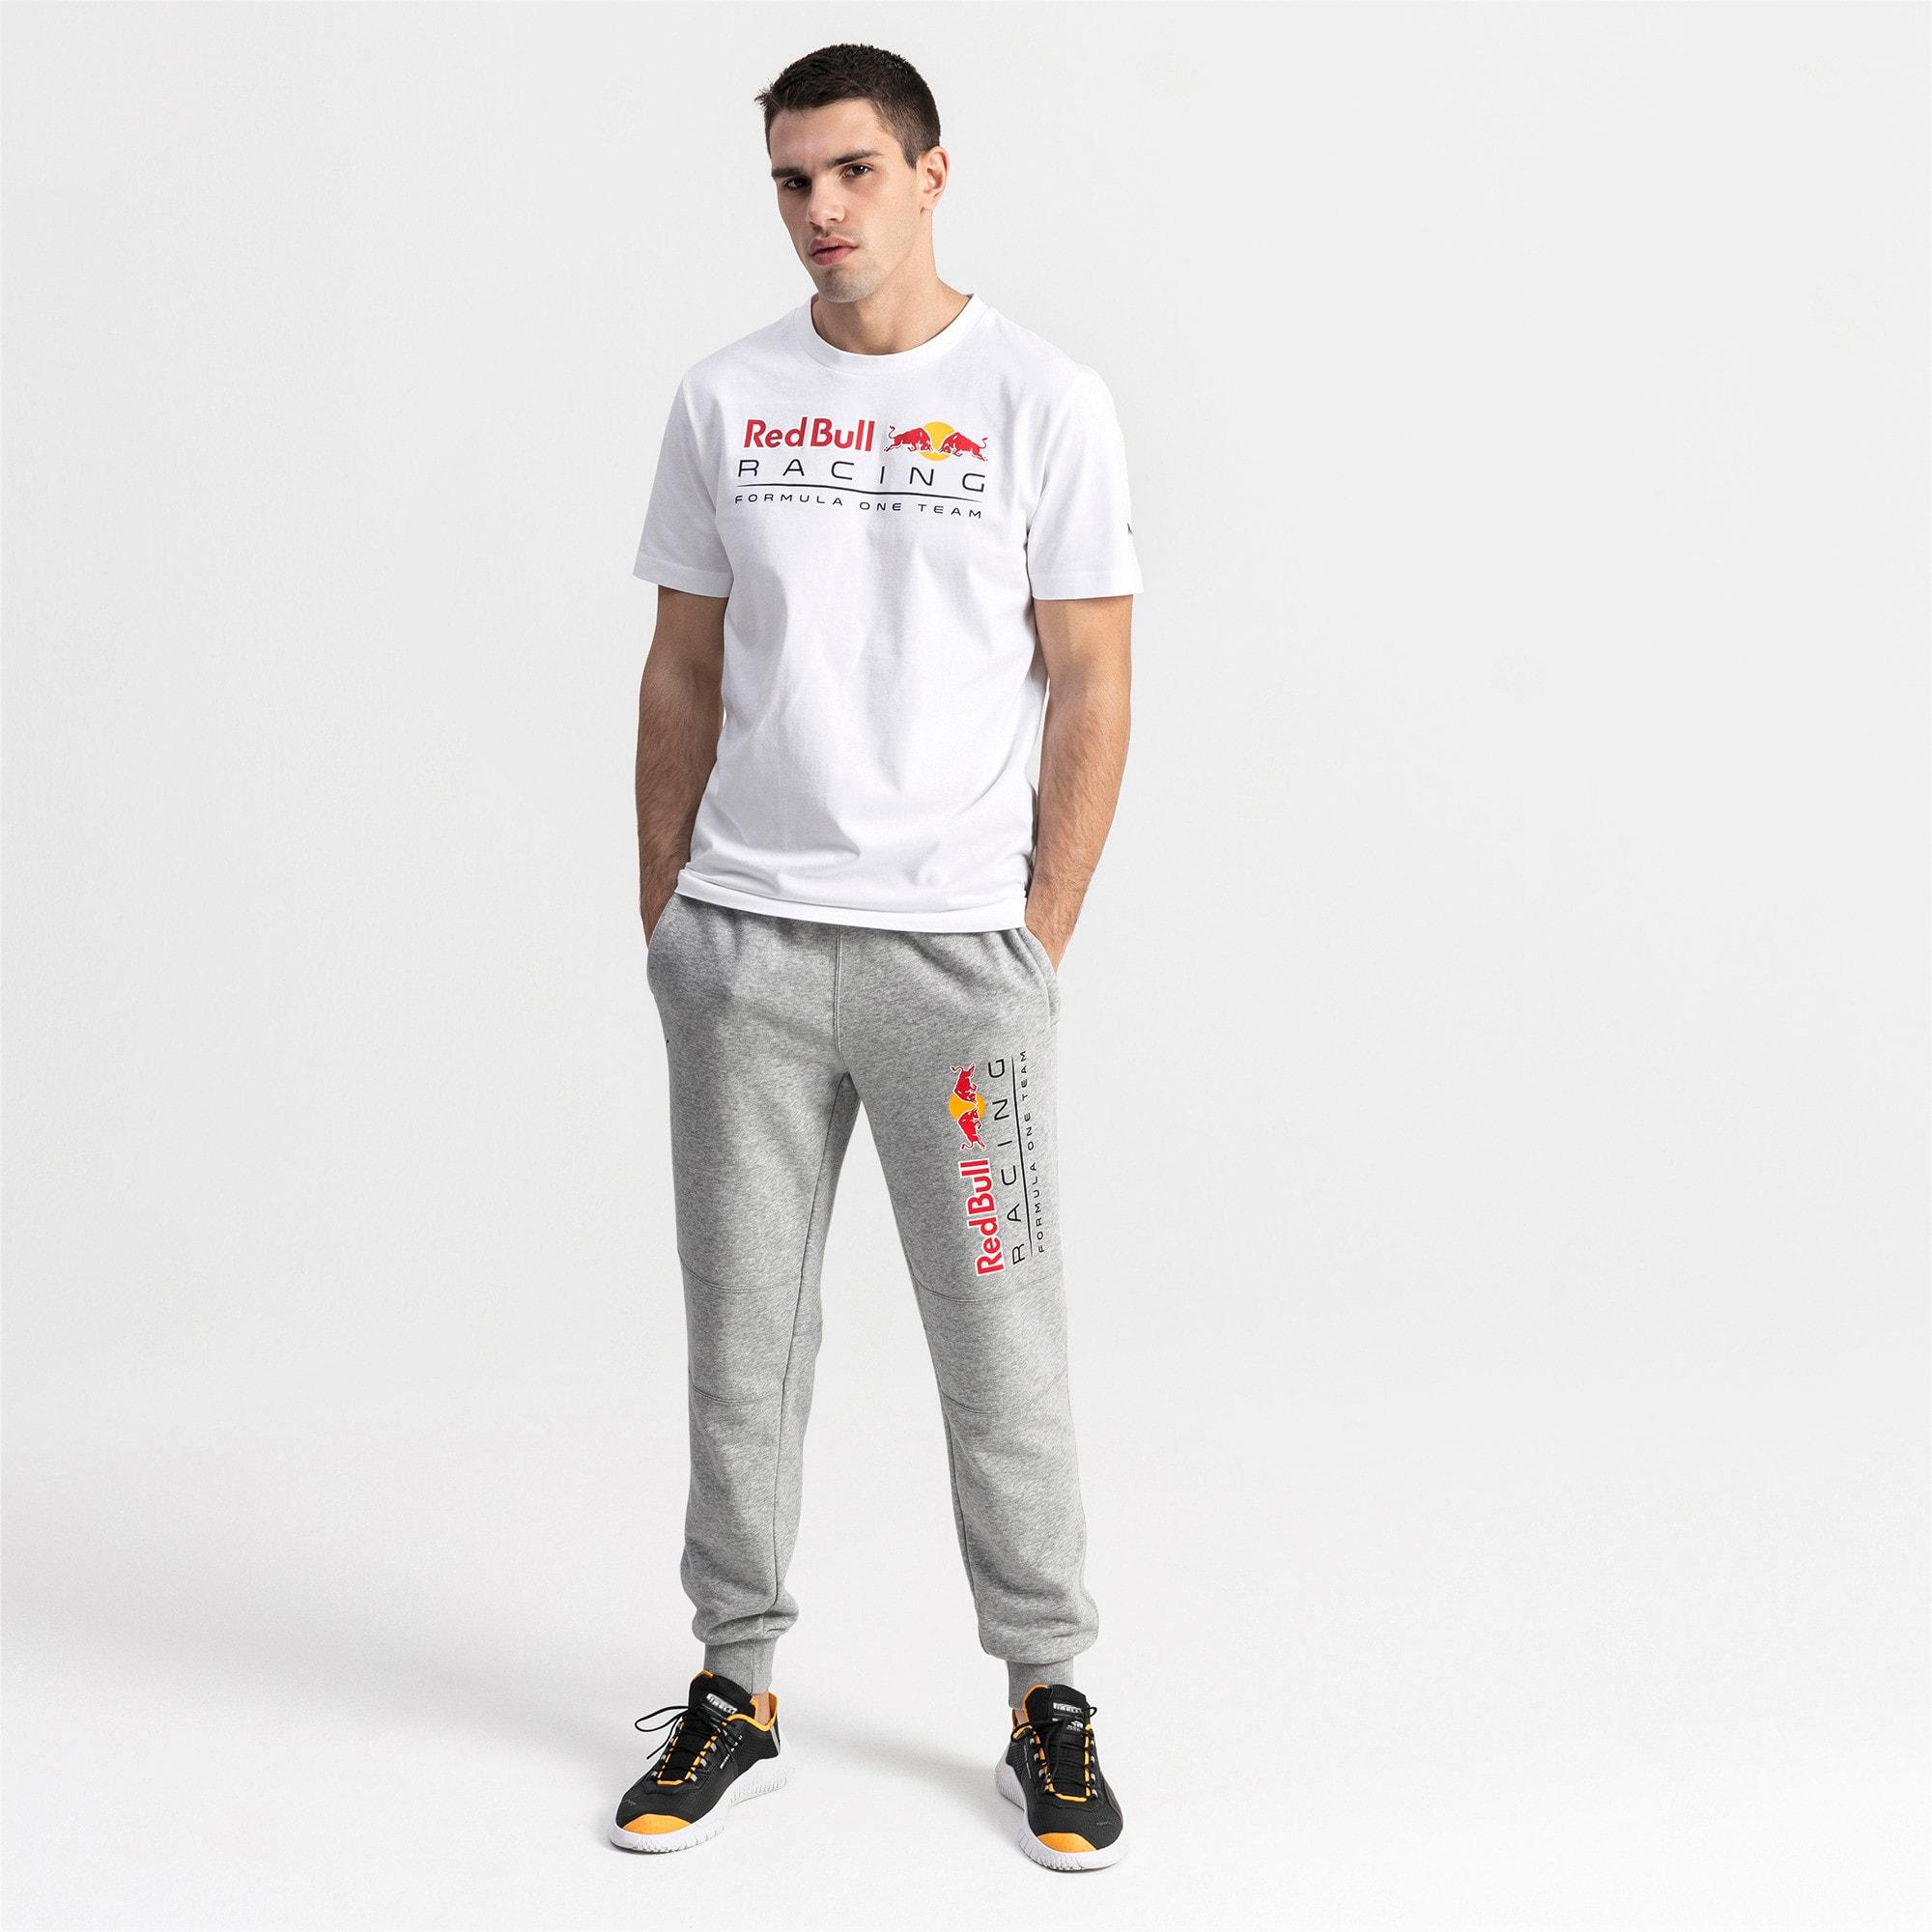 Thumbnail 3 of Red Bull Racing logo-T-shirt voor heren, Puma White, medium